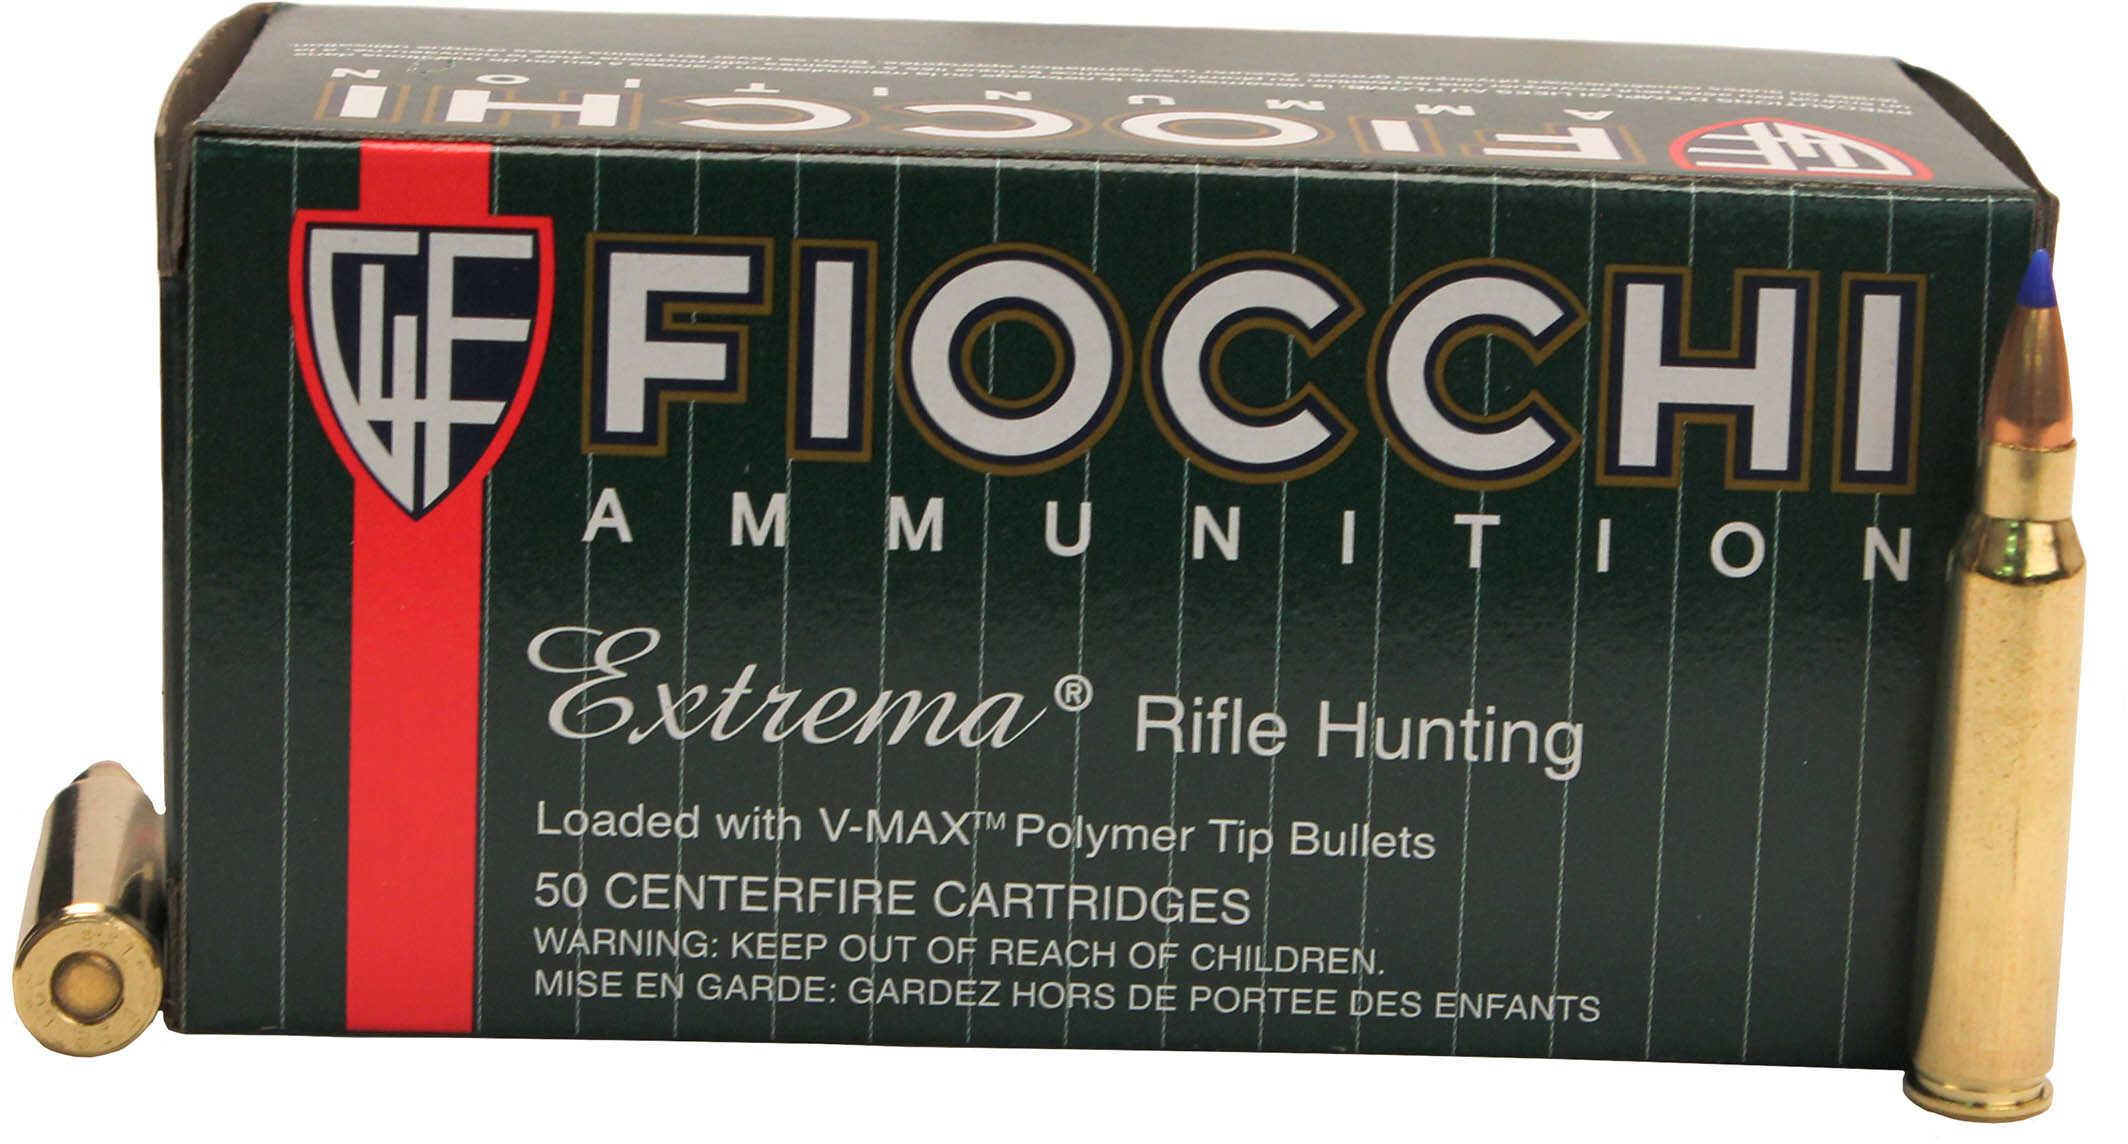 Fiocchii Extrema Rifle Hunting Ammunition 223 Remington - 40 Grains - Hornady V-MAX - 3650 FPS - 50 per b 223HVB50